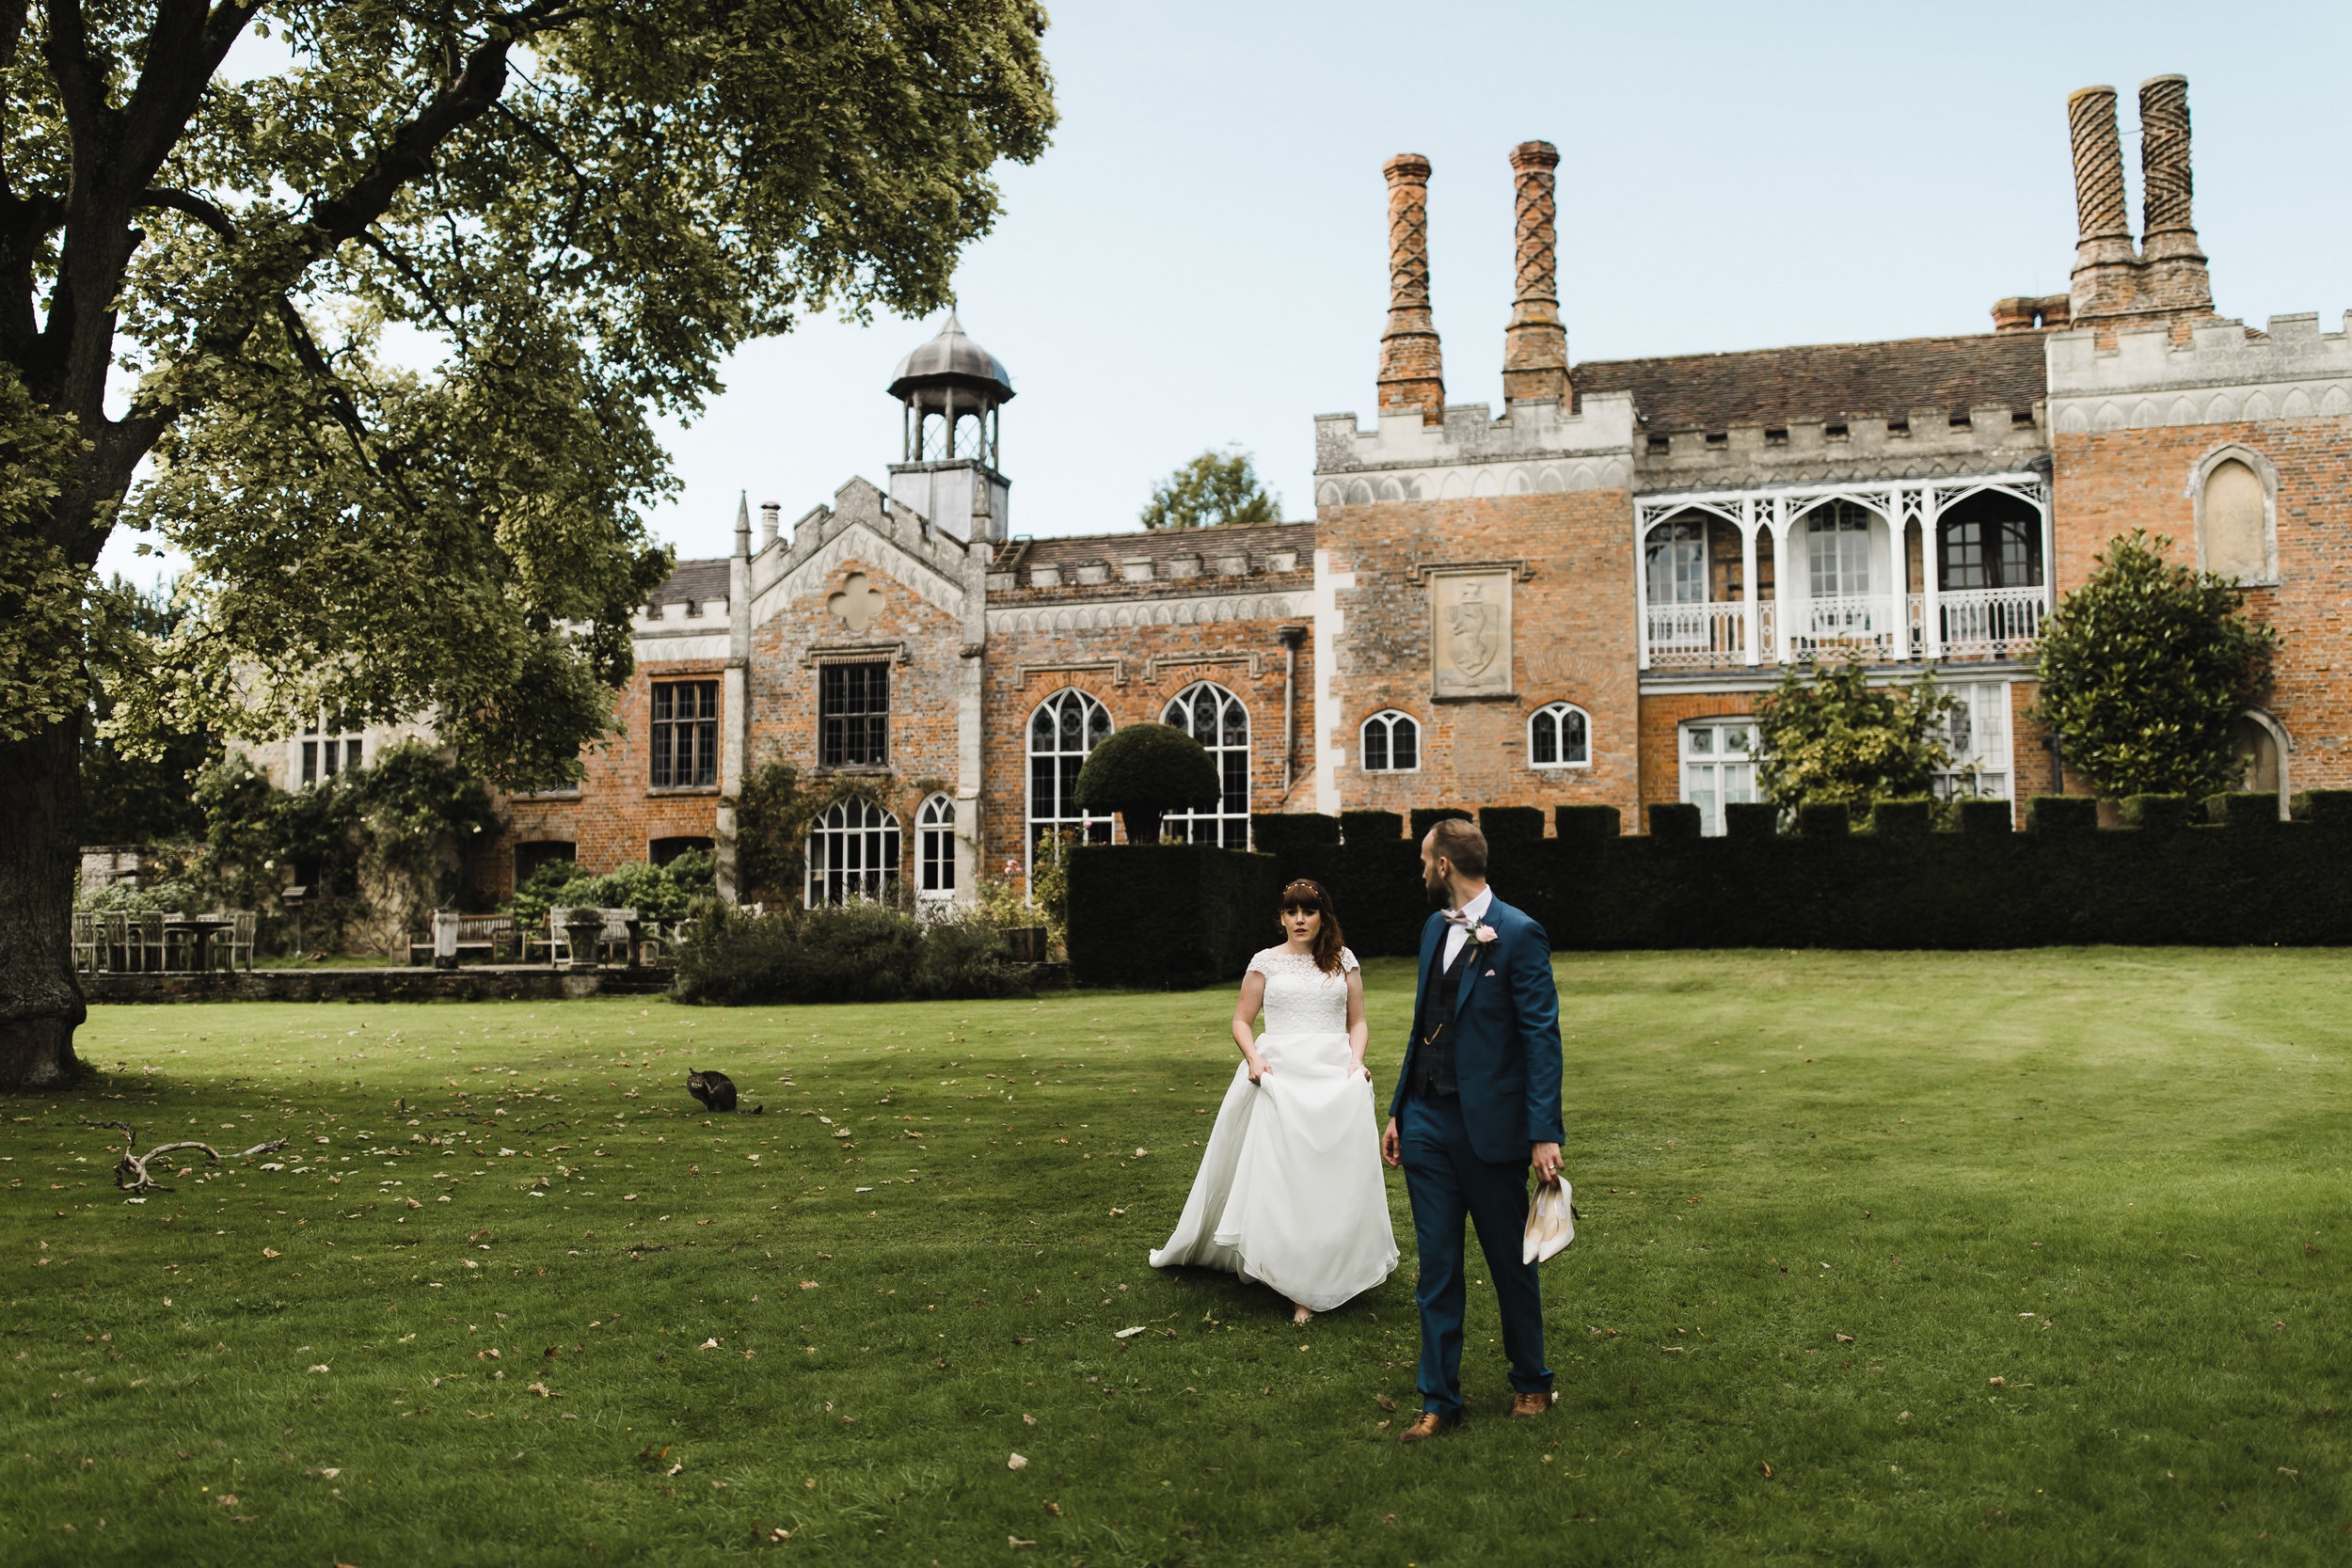 Nether_Wichendon_House_Wedding_064.jpg